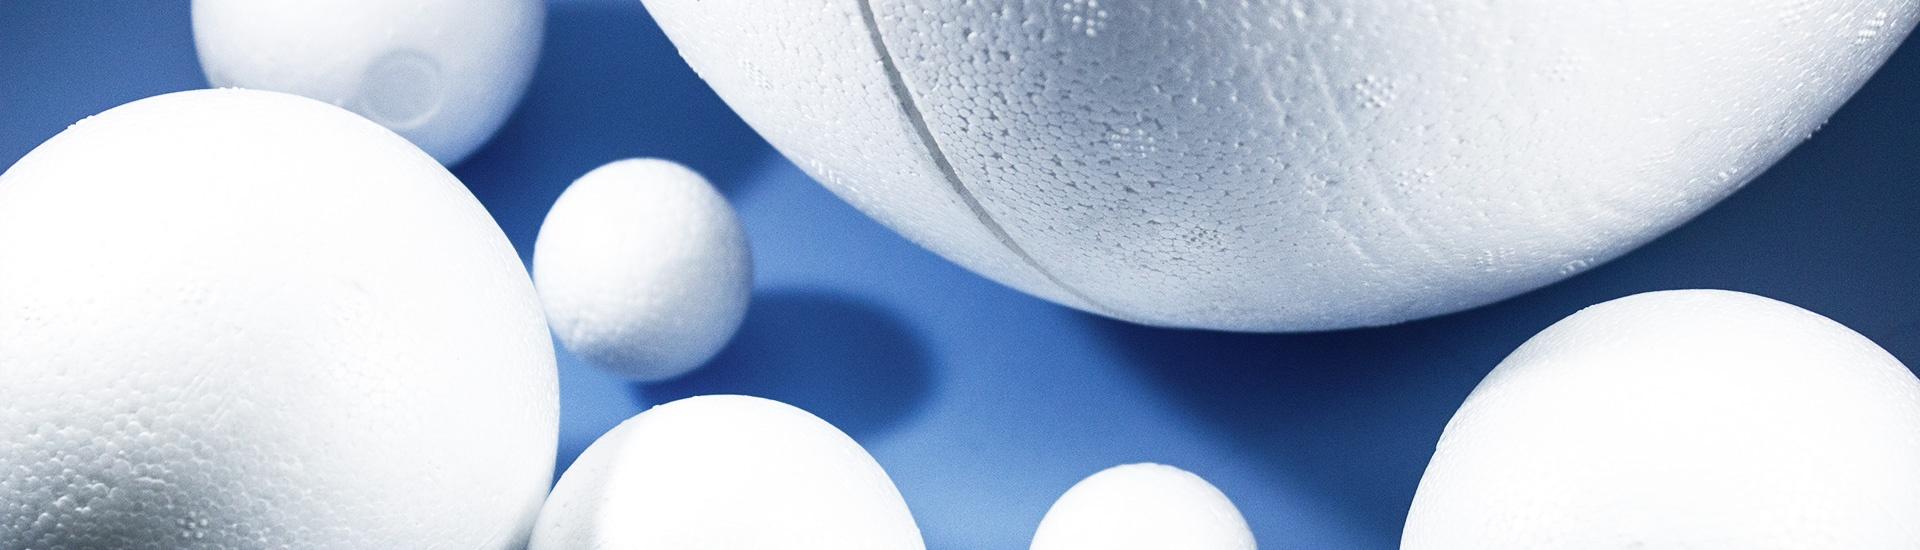 Boules en polystyrène expansé